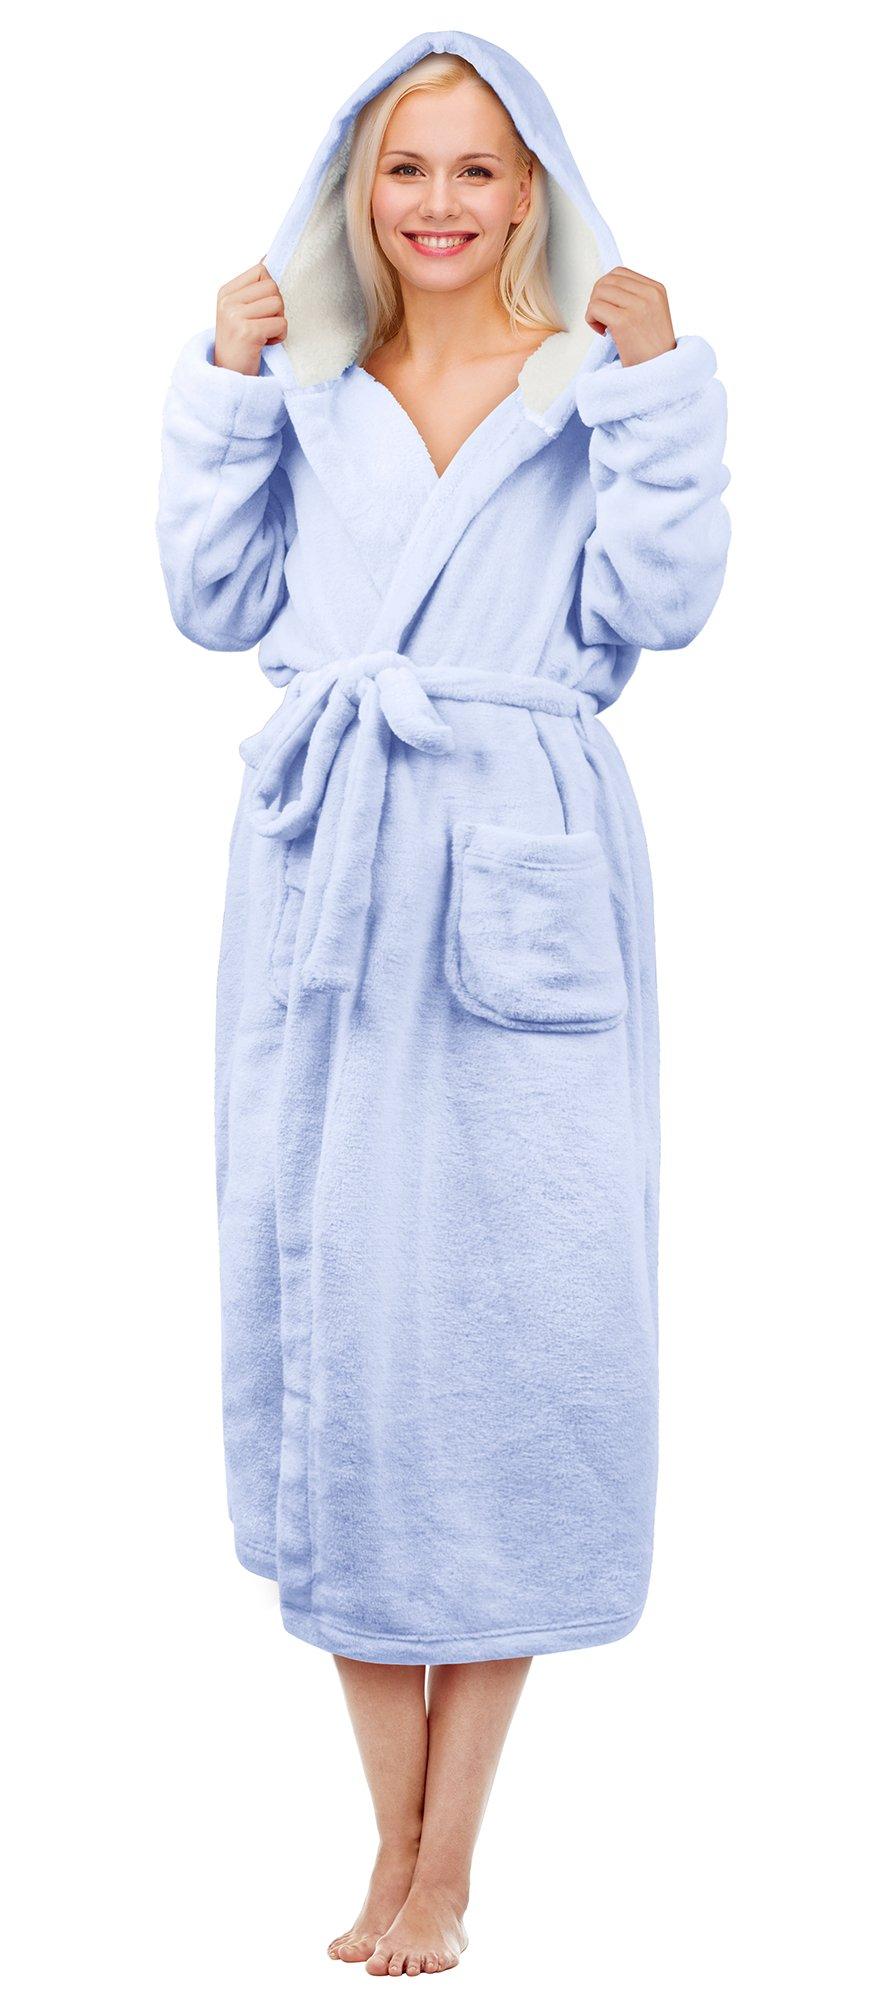 Hooded Sherpa Robe Long Plush Fuzzy Bathrobe For Women With Hood Sherpa Lined